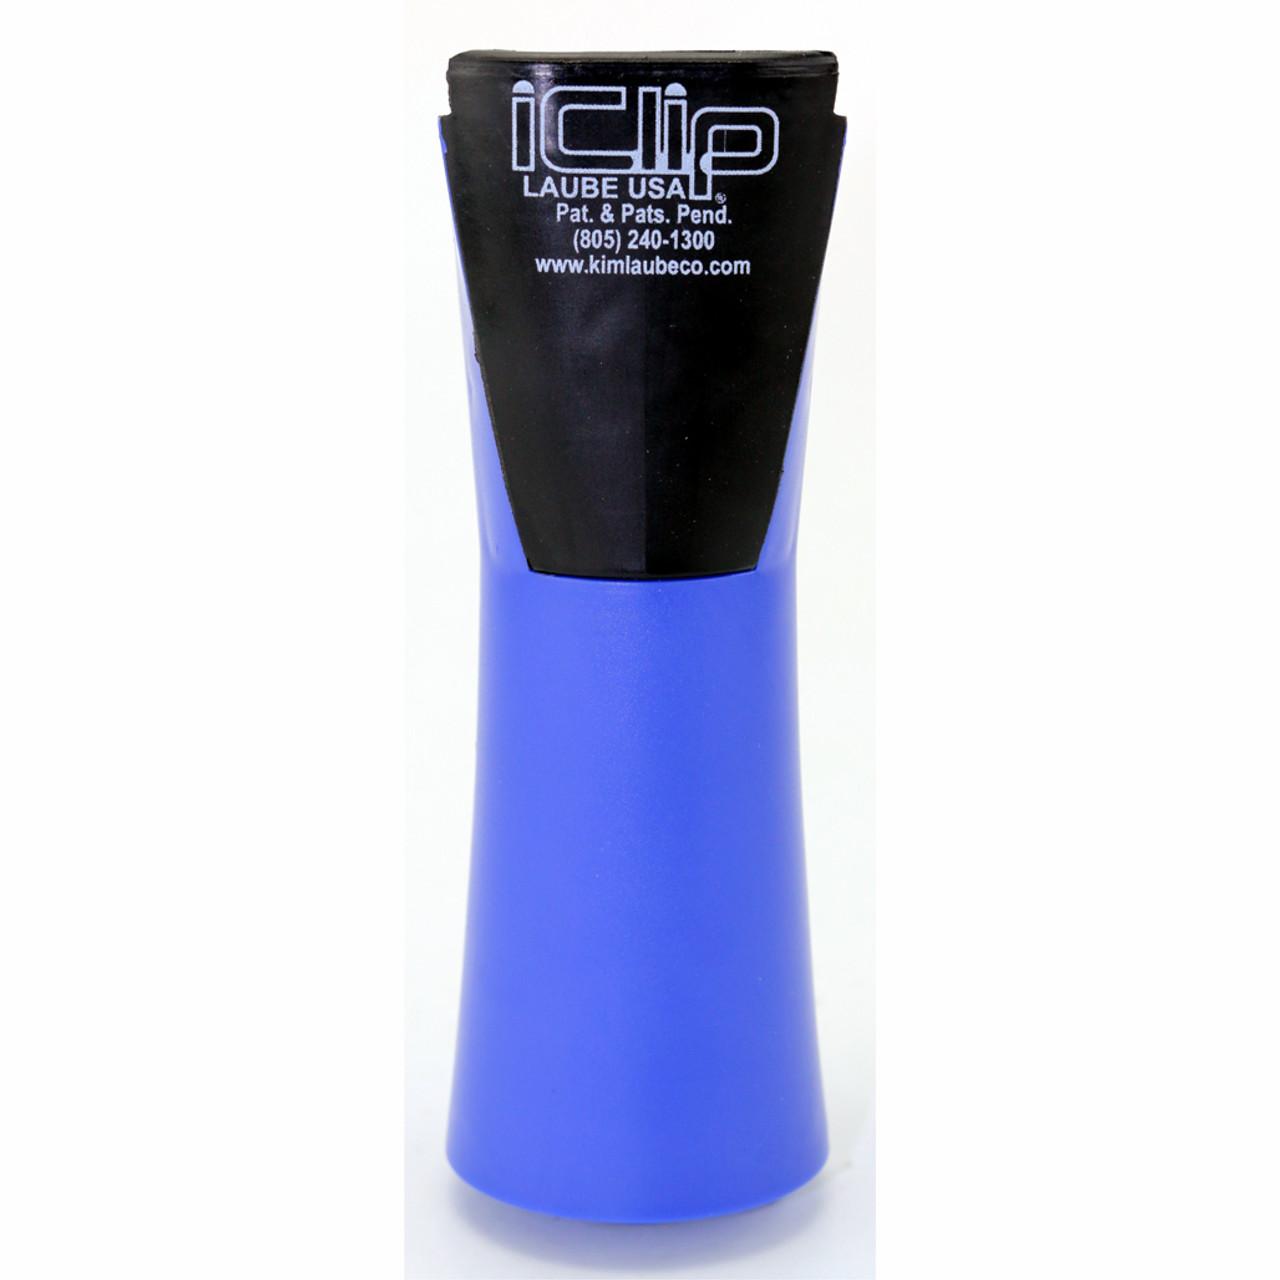 Laube iClip Blue handpiece